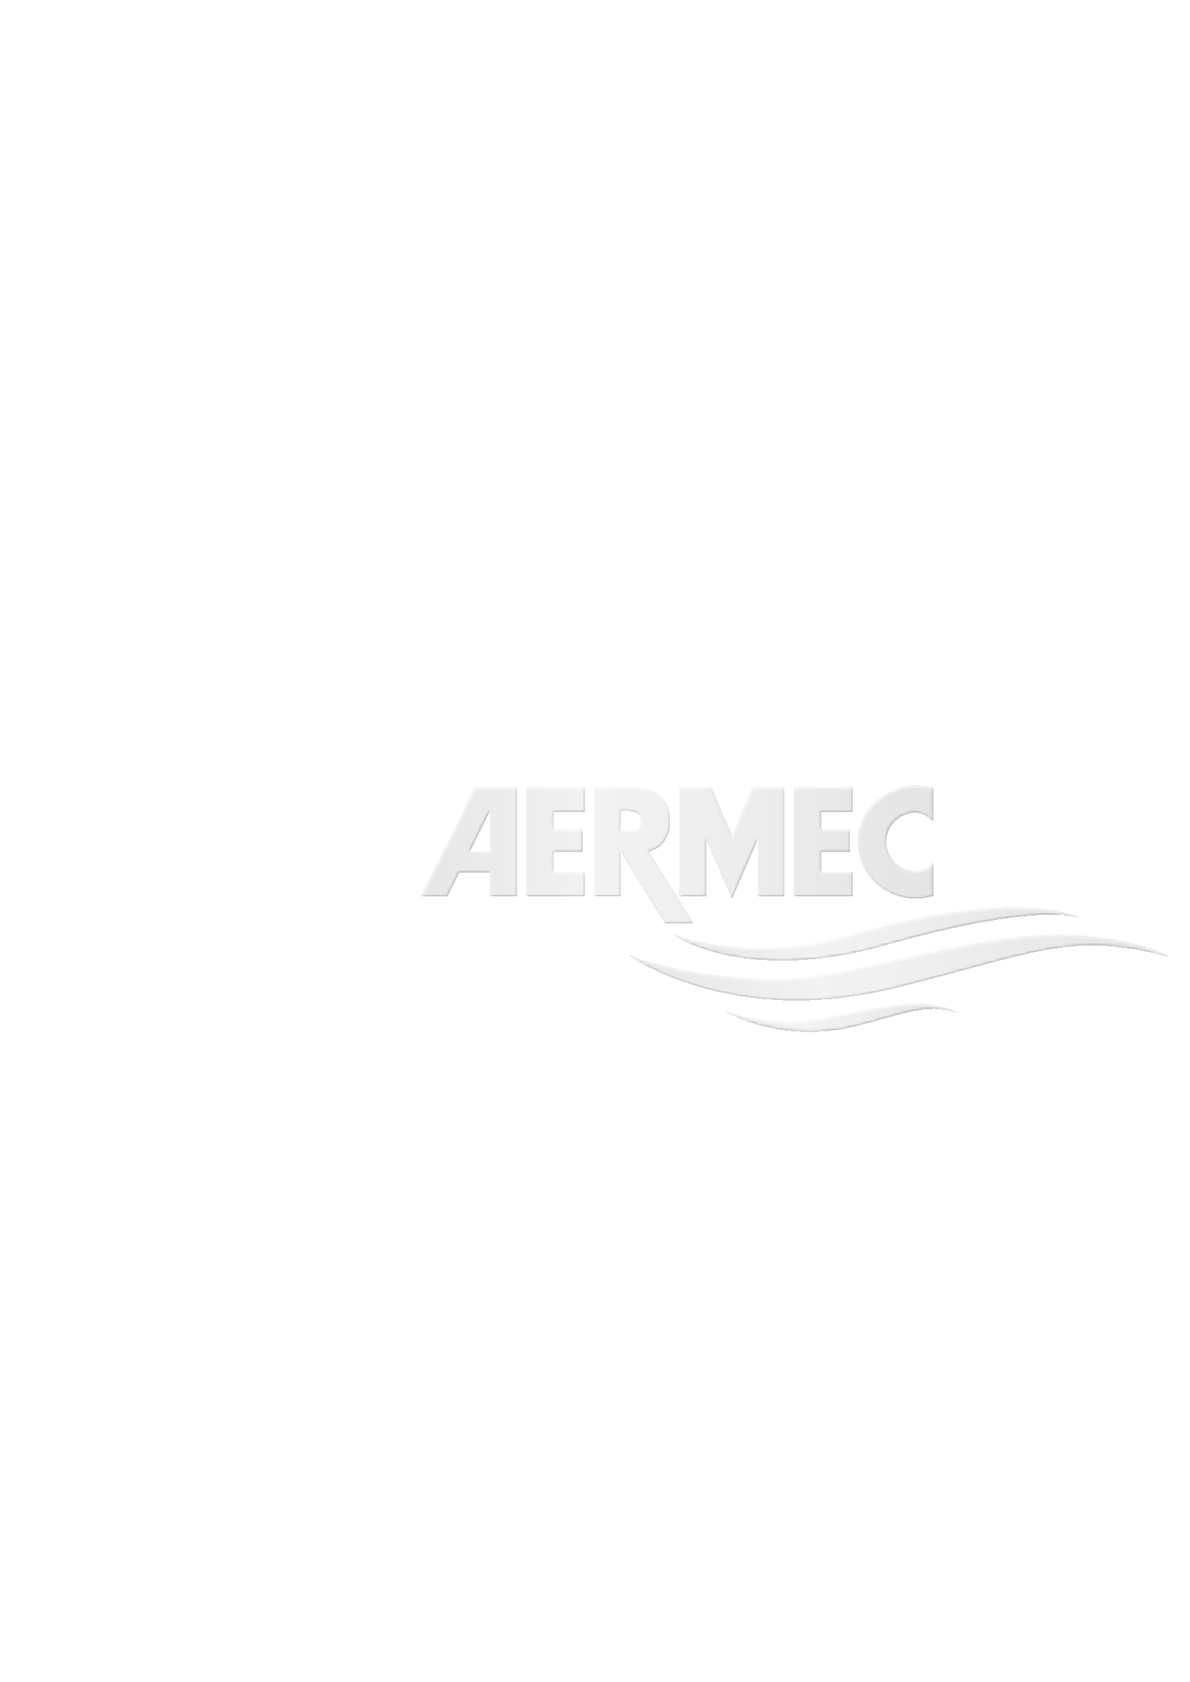 Sharp Aircon Plasmacluster Low Wattage 05 Pk Ah Ap 5 Shl6 Daftar Ac Inverter 05pk Type X6vey J Tech Calamo